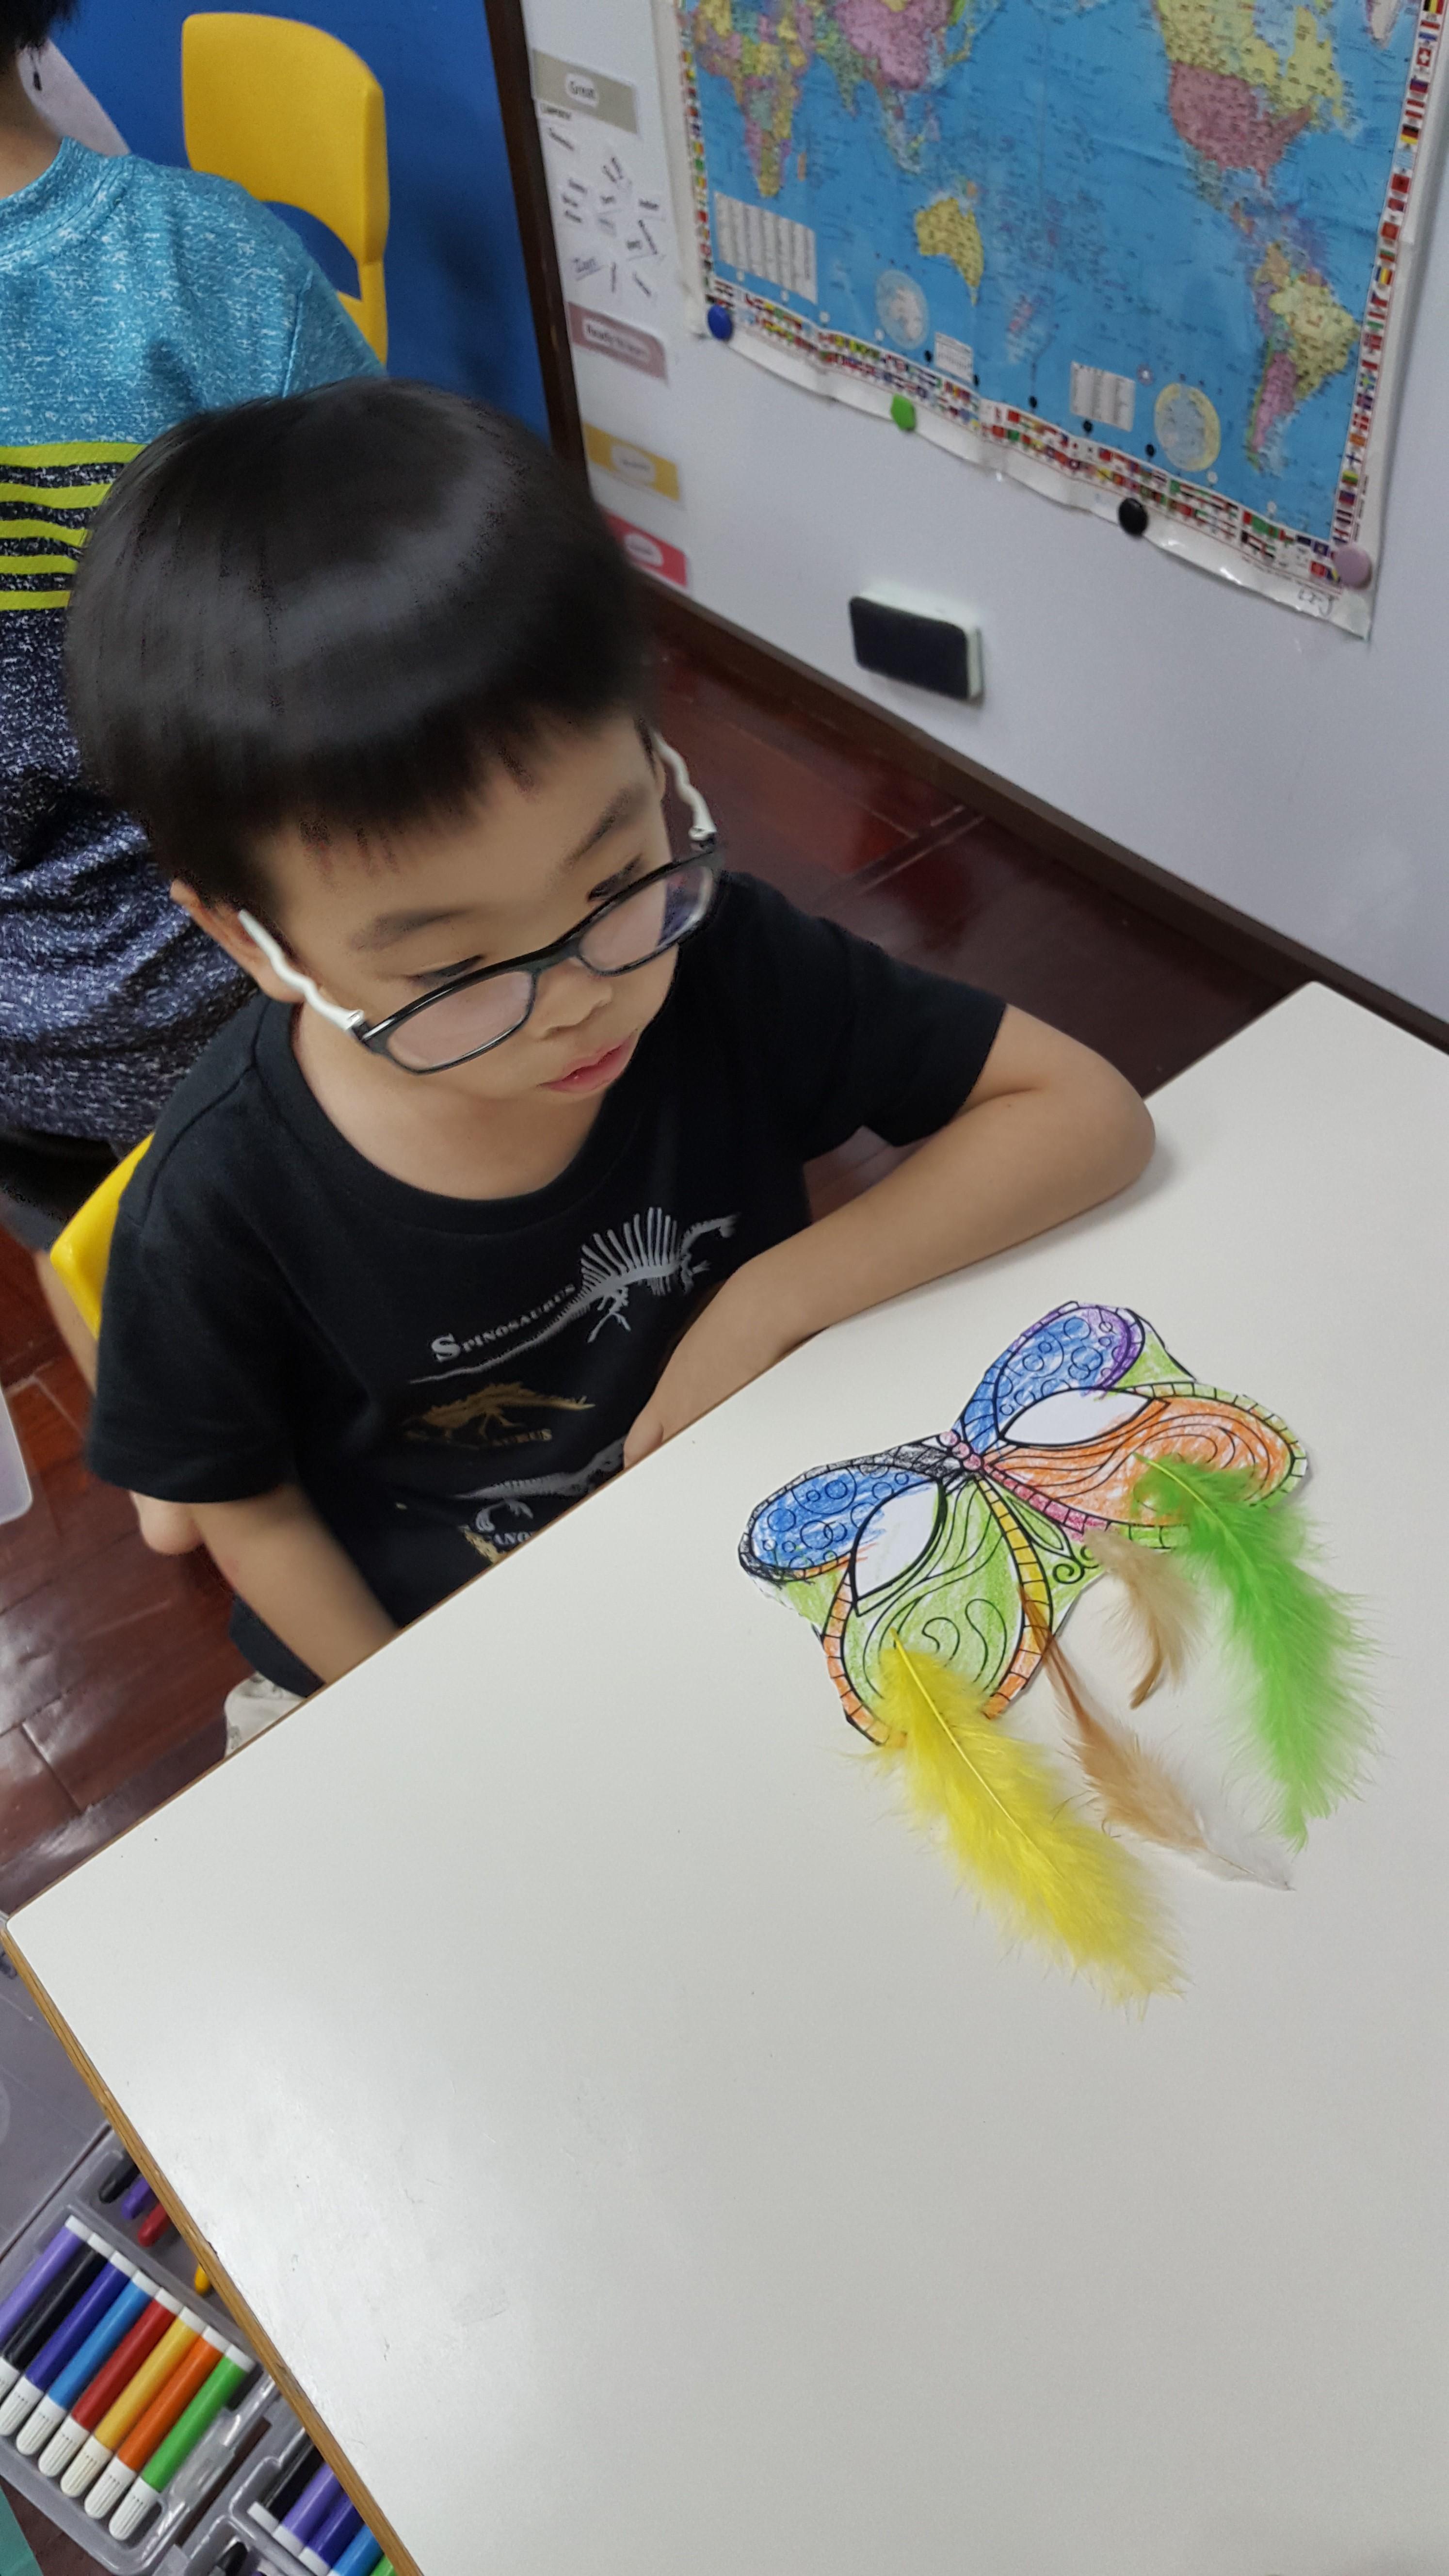 Art-製作嘉年華面具嚕 (2)